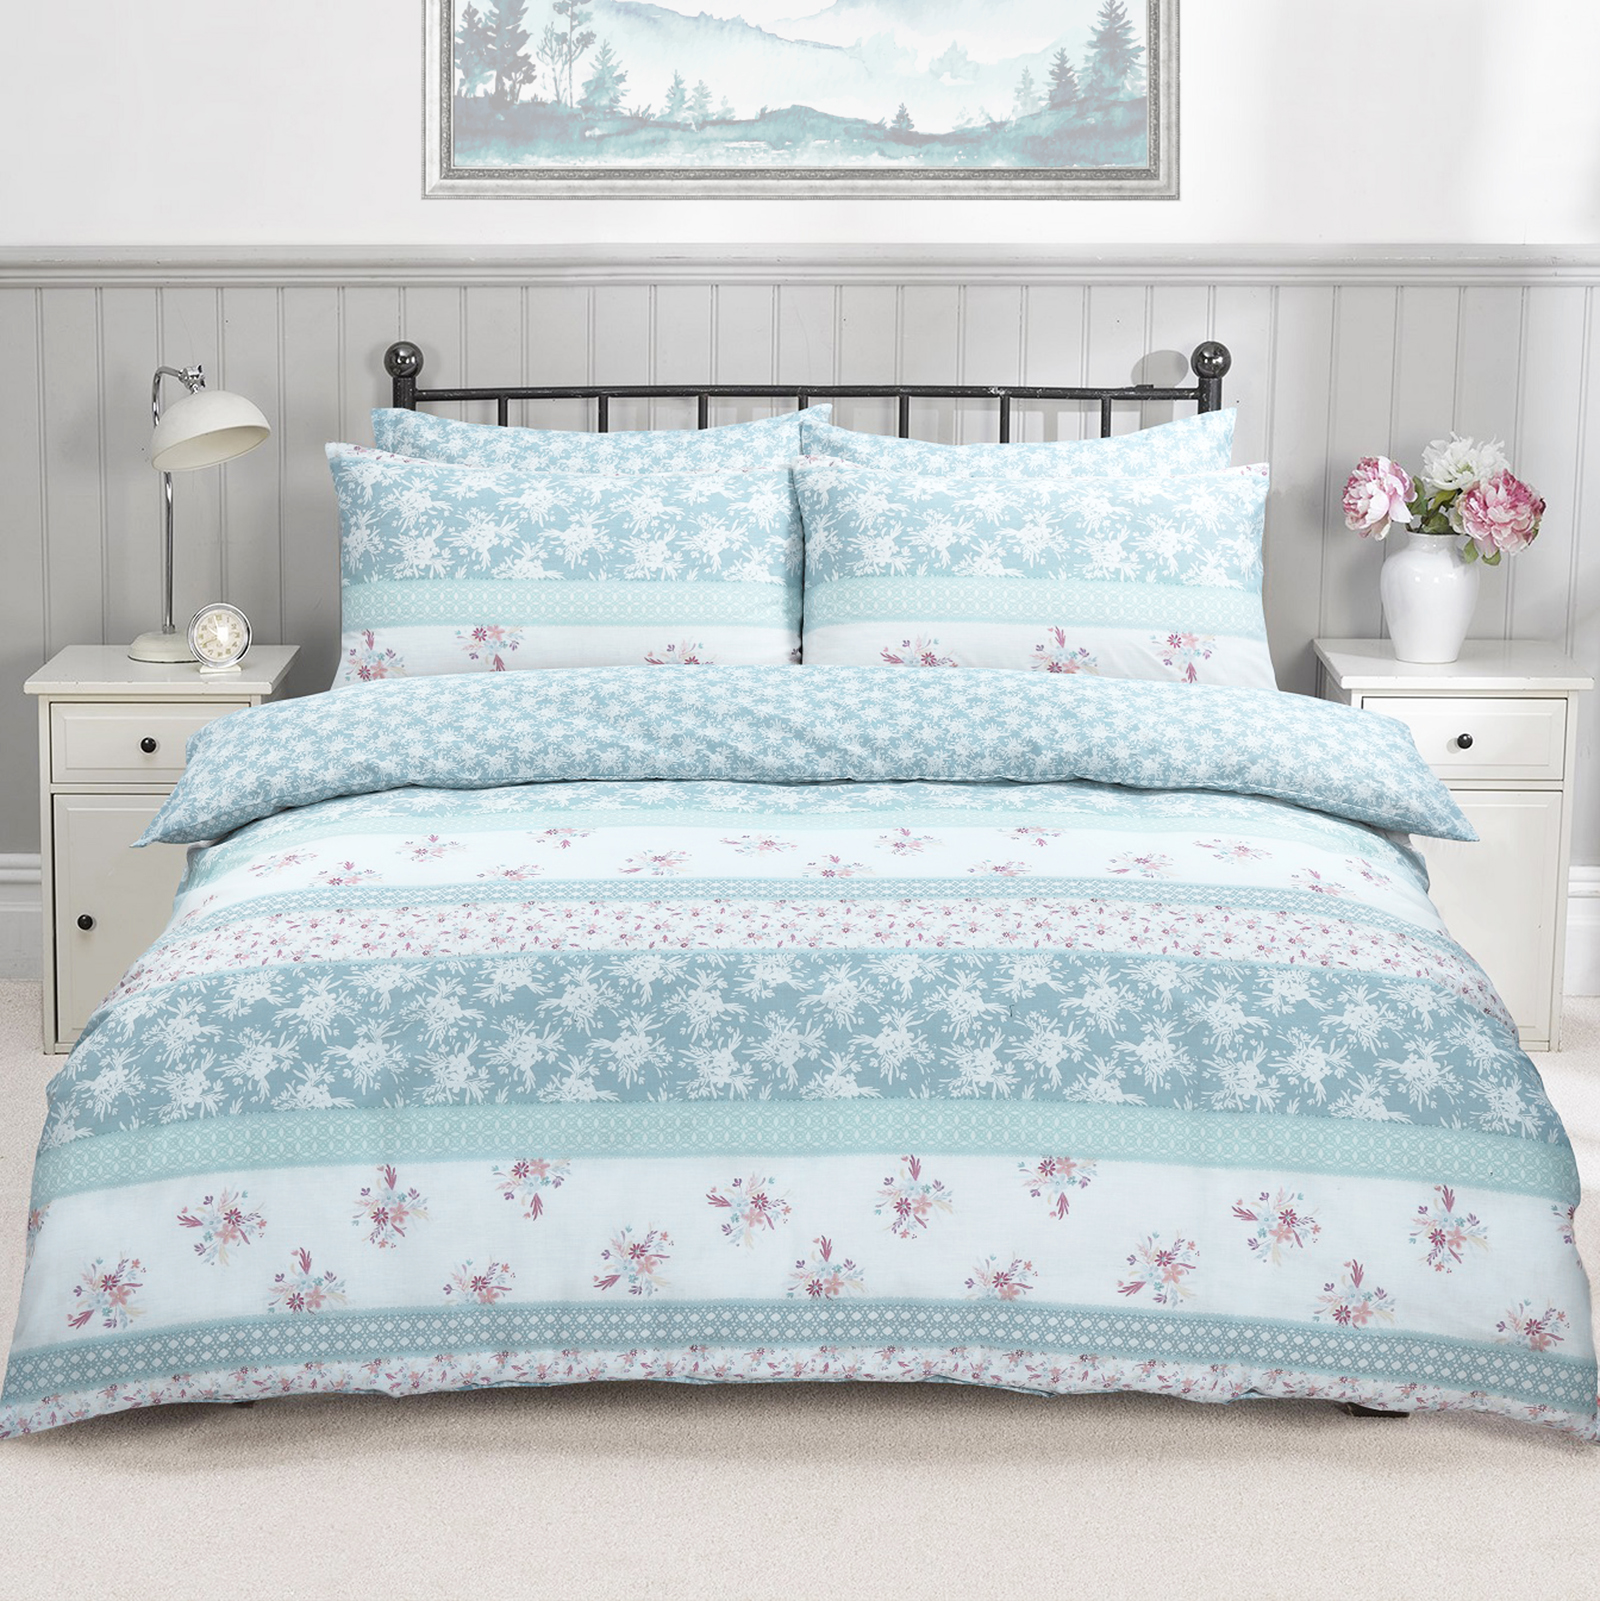 Patchwork Floral Duvet Cover Set Wholesale Bedding